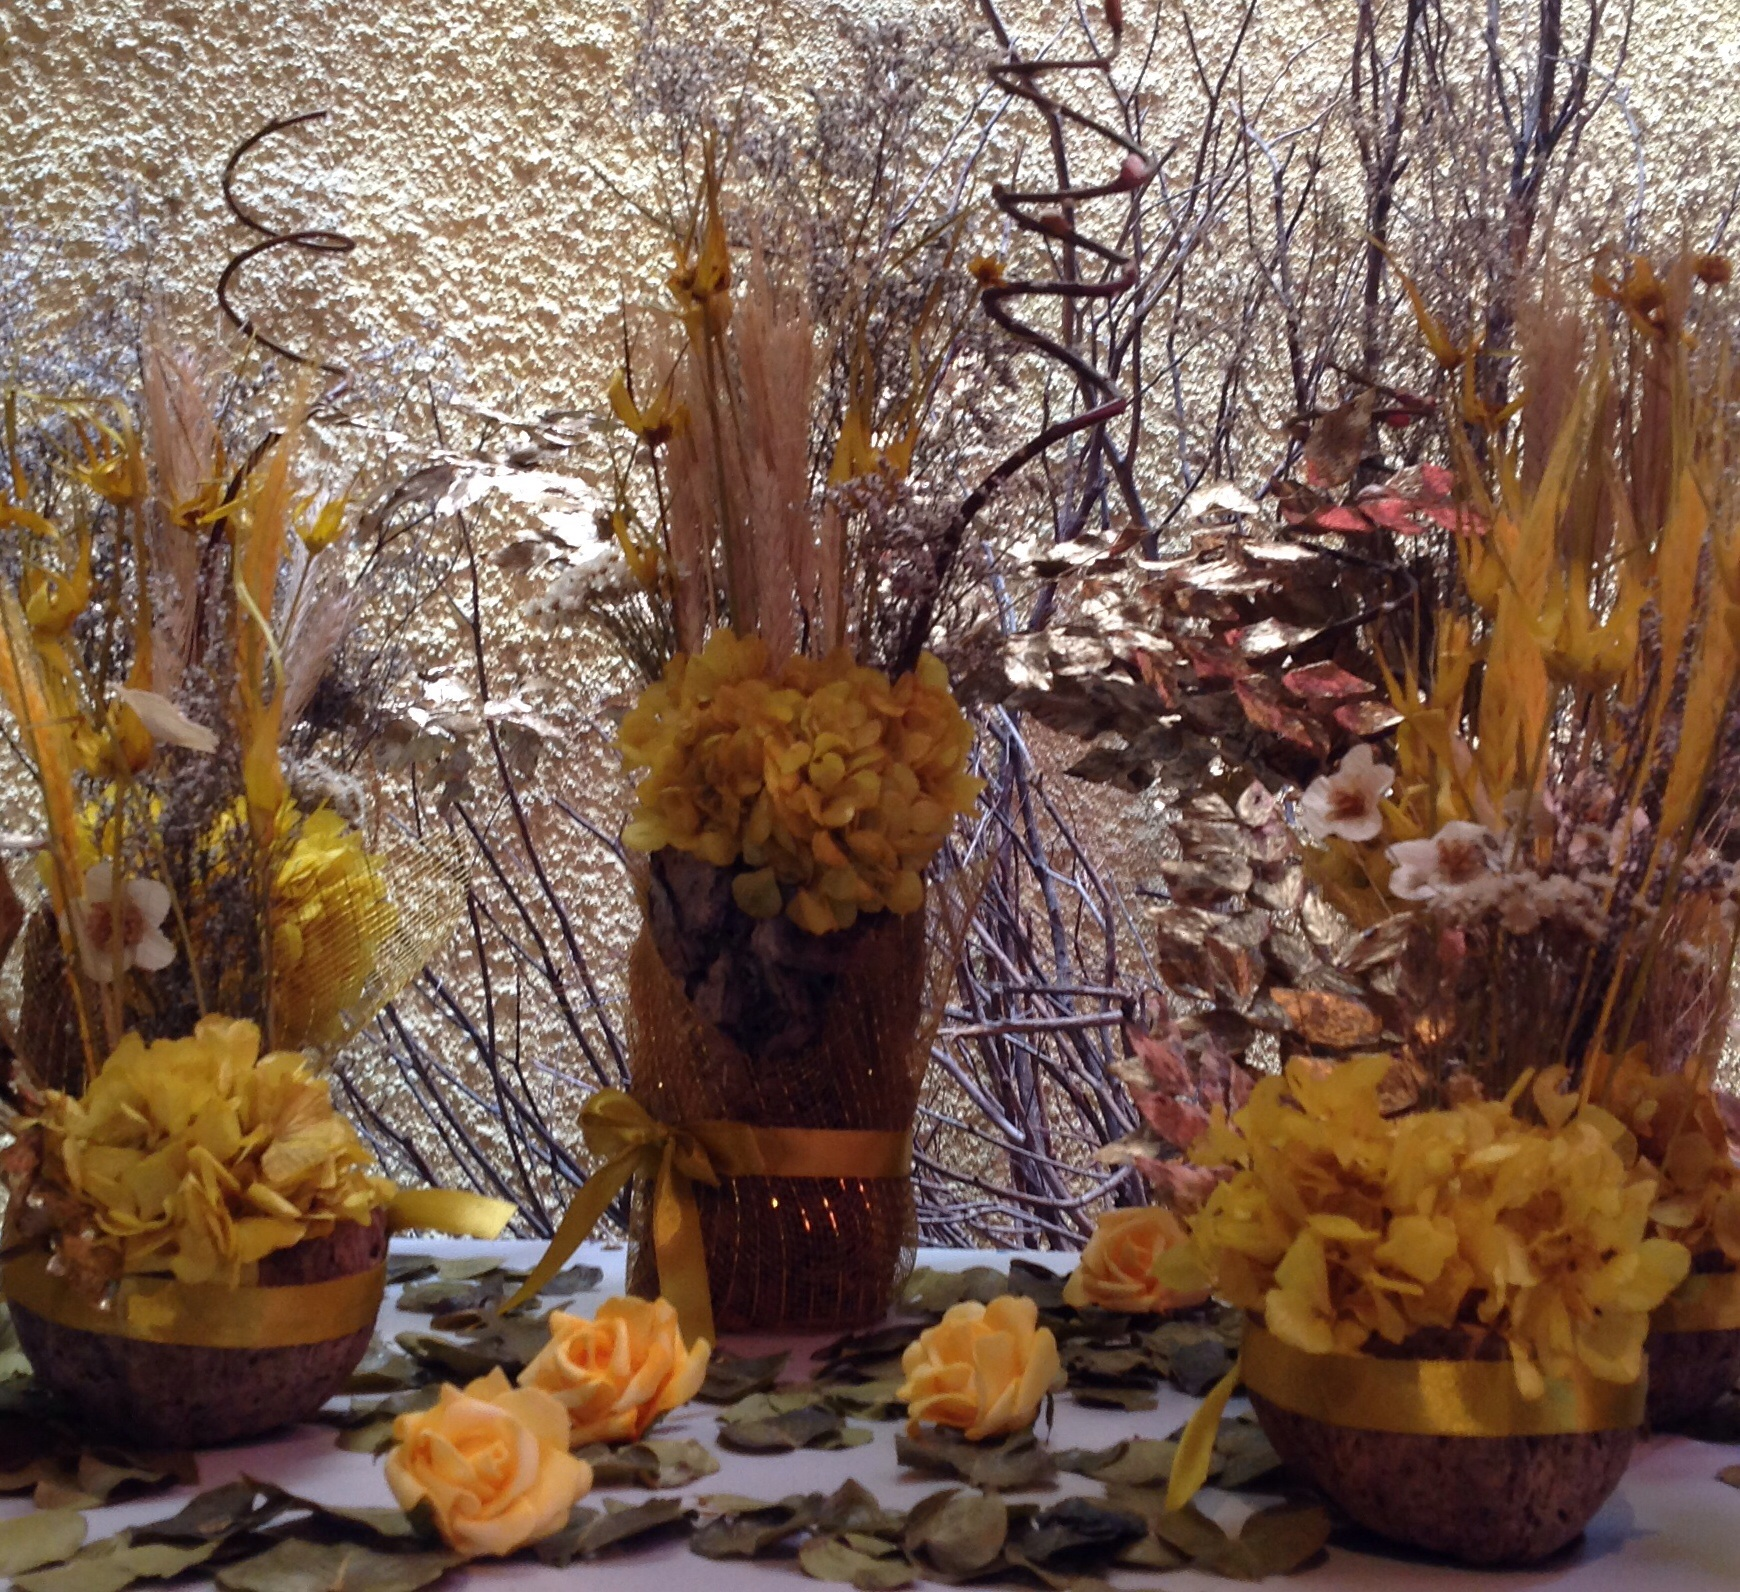 decoracao festa rustica:kit-festa-dourada-flores-secas-kit-festa-flores-secas kit-festa